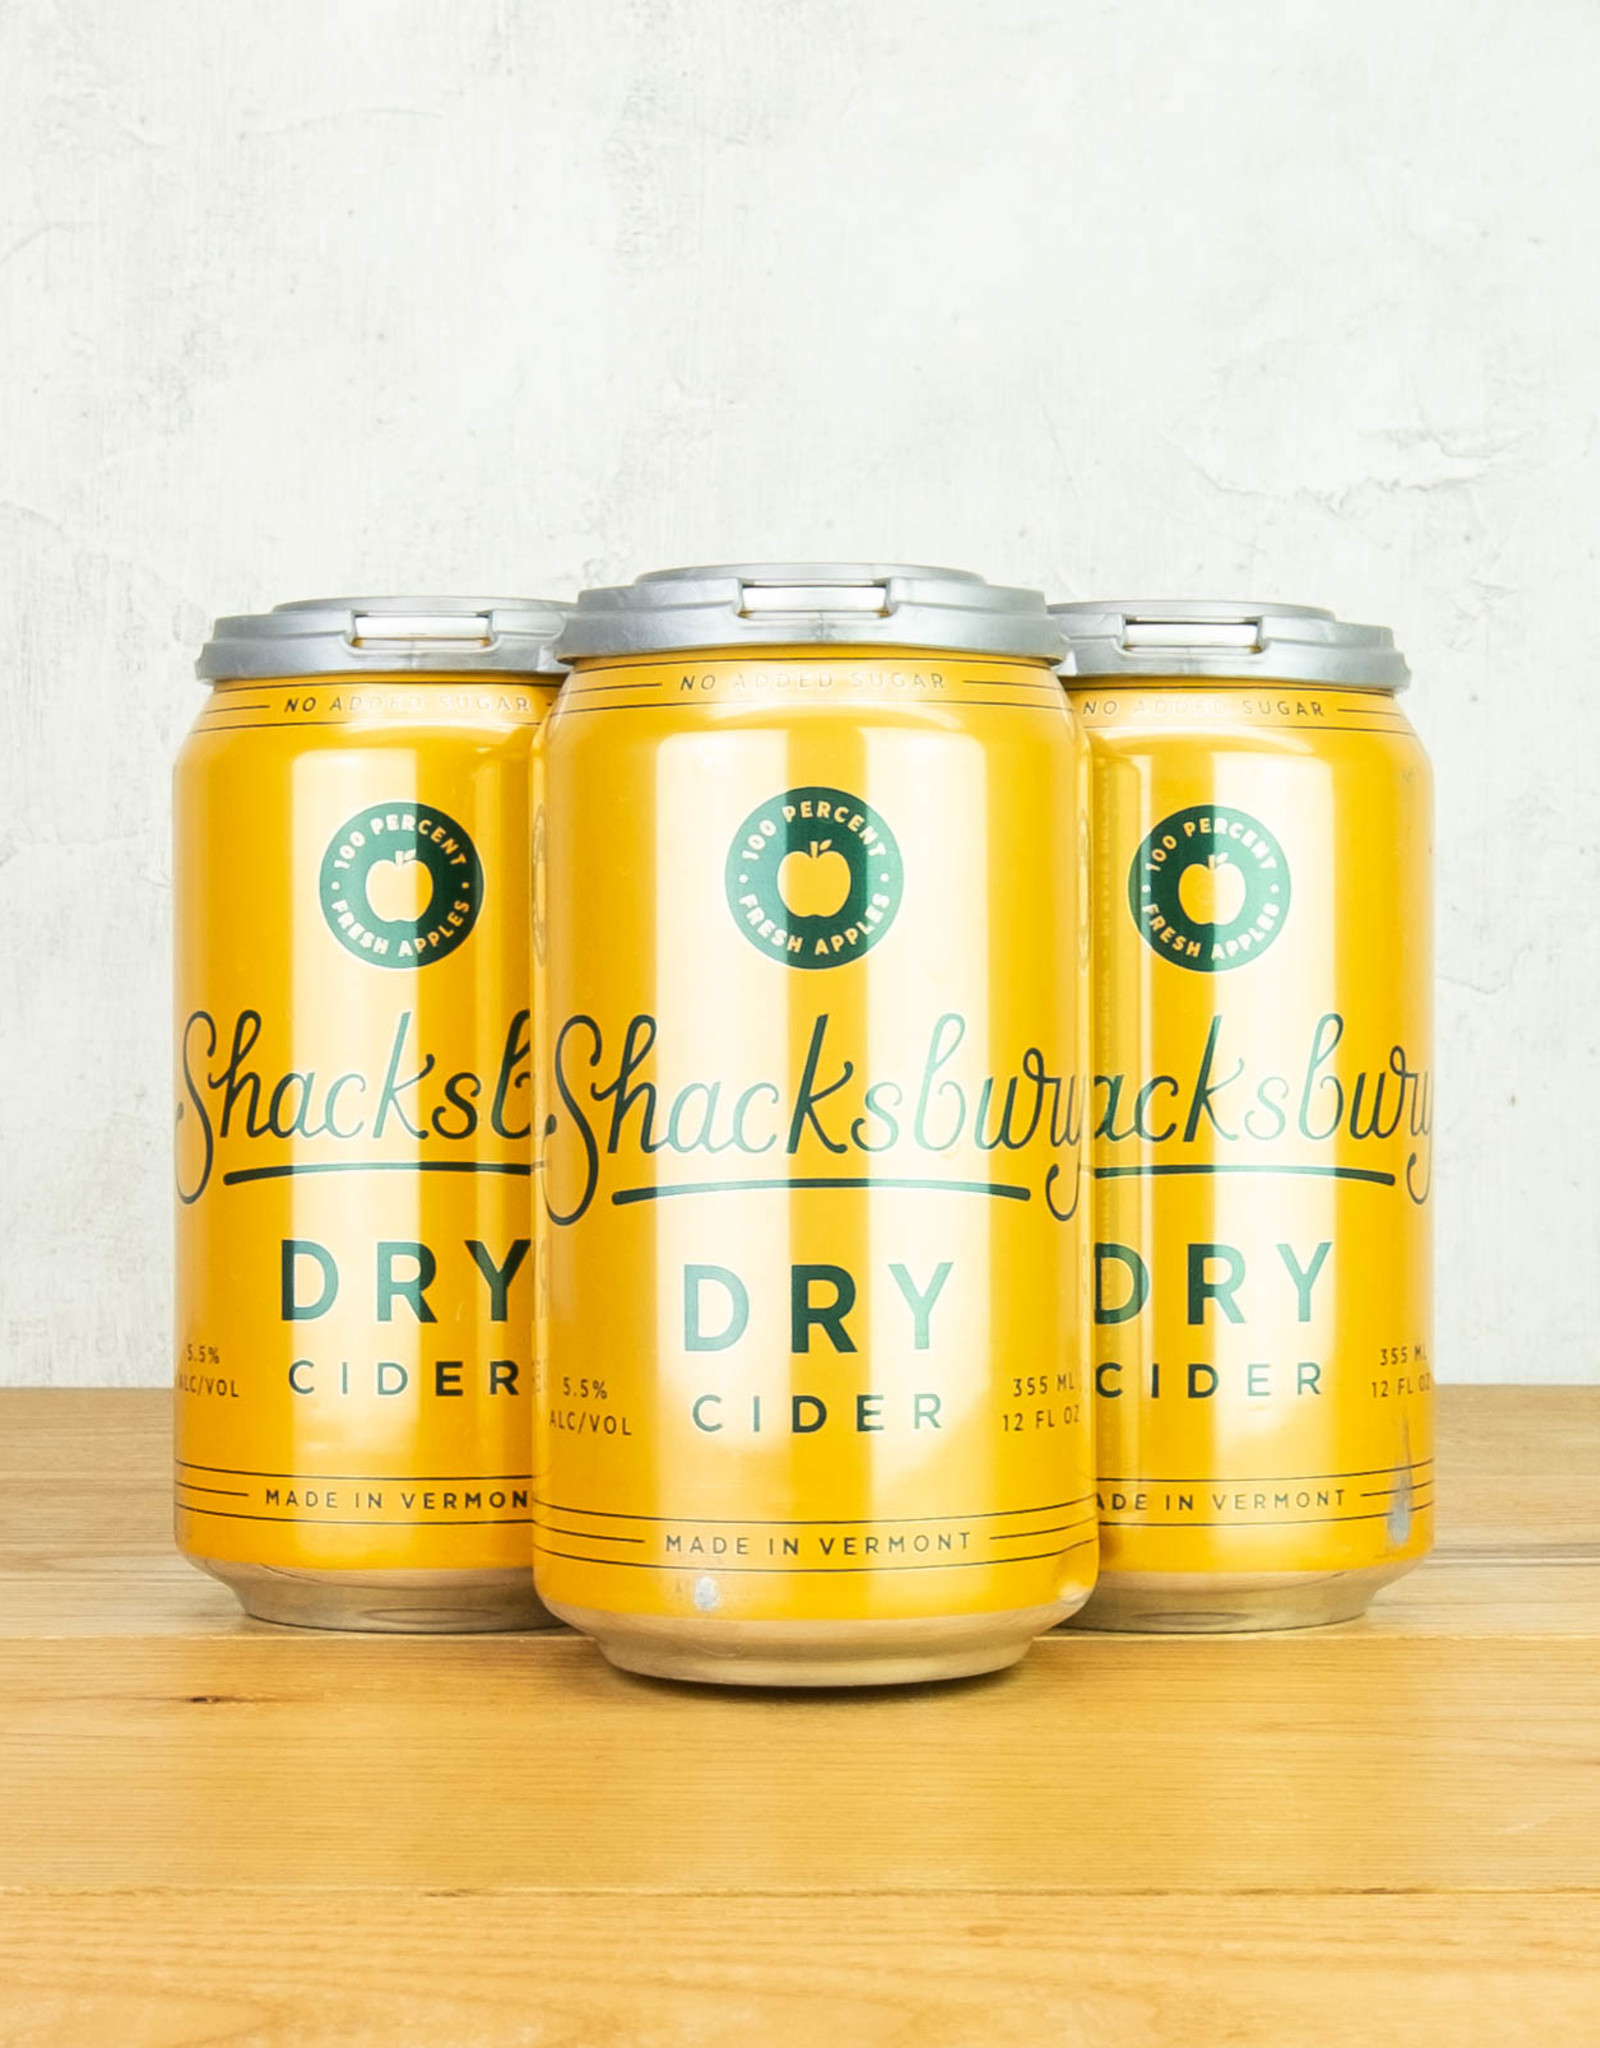 Shacksbury Dry Cider 4pk